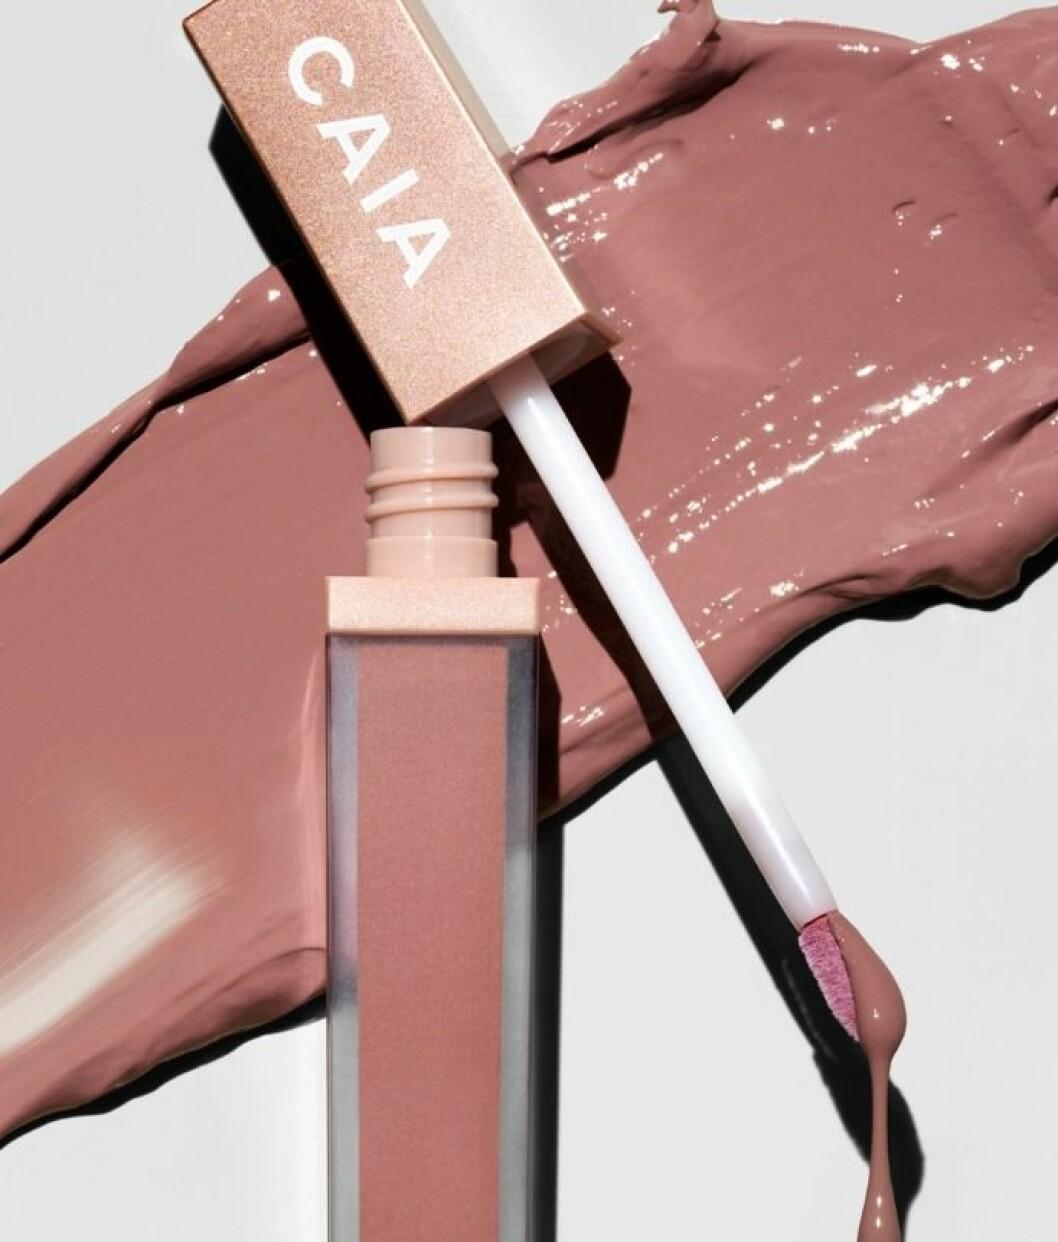 caia cosmetics flytande lappstift